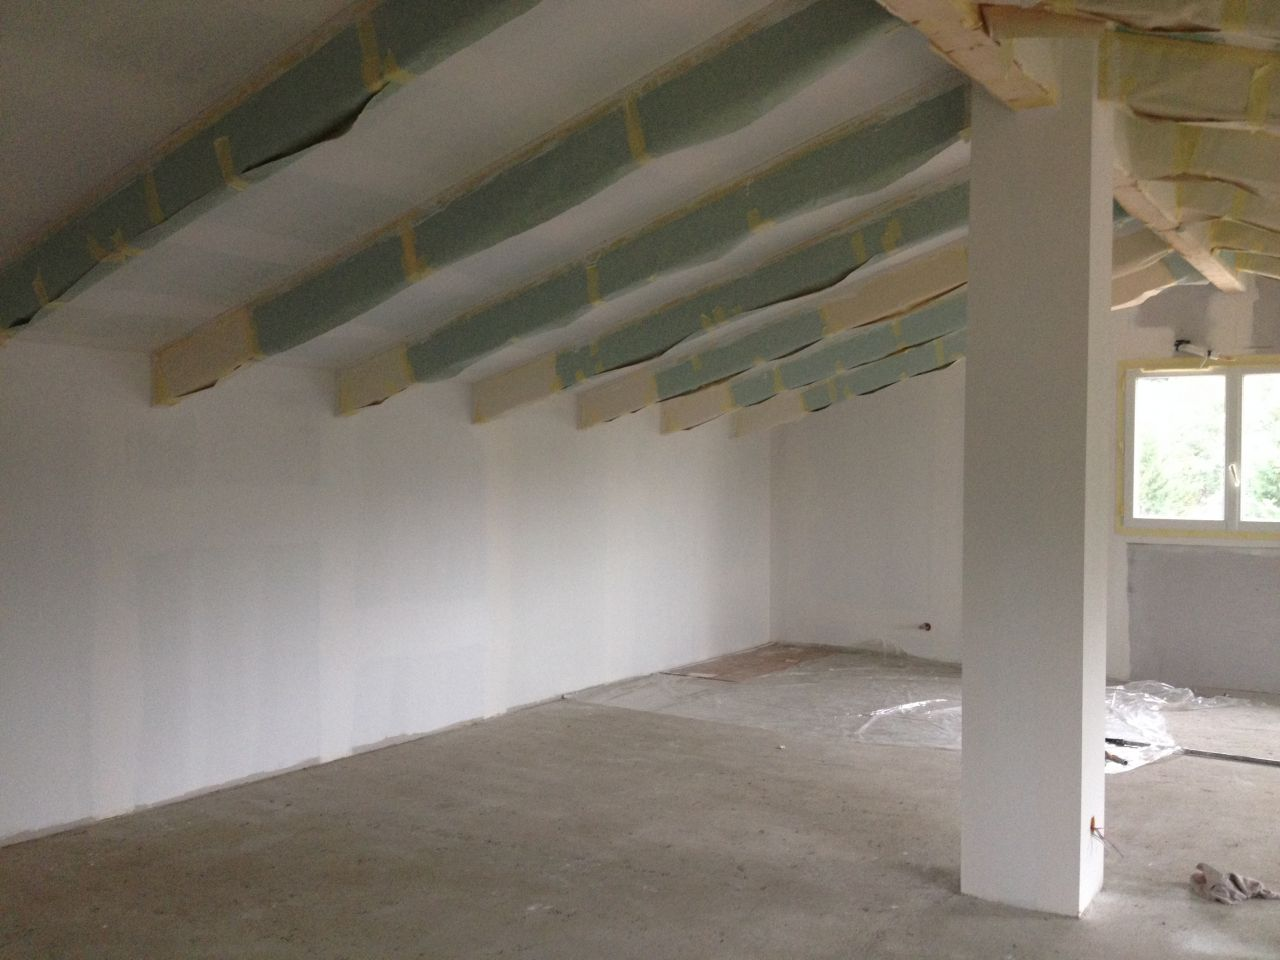 La peinture partie 1 grenier fini corse - Retouche peinture plafond ...